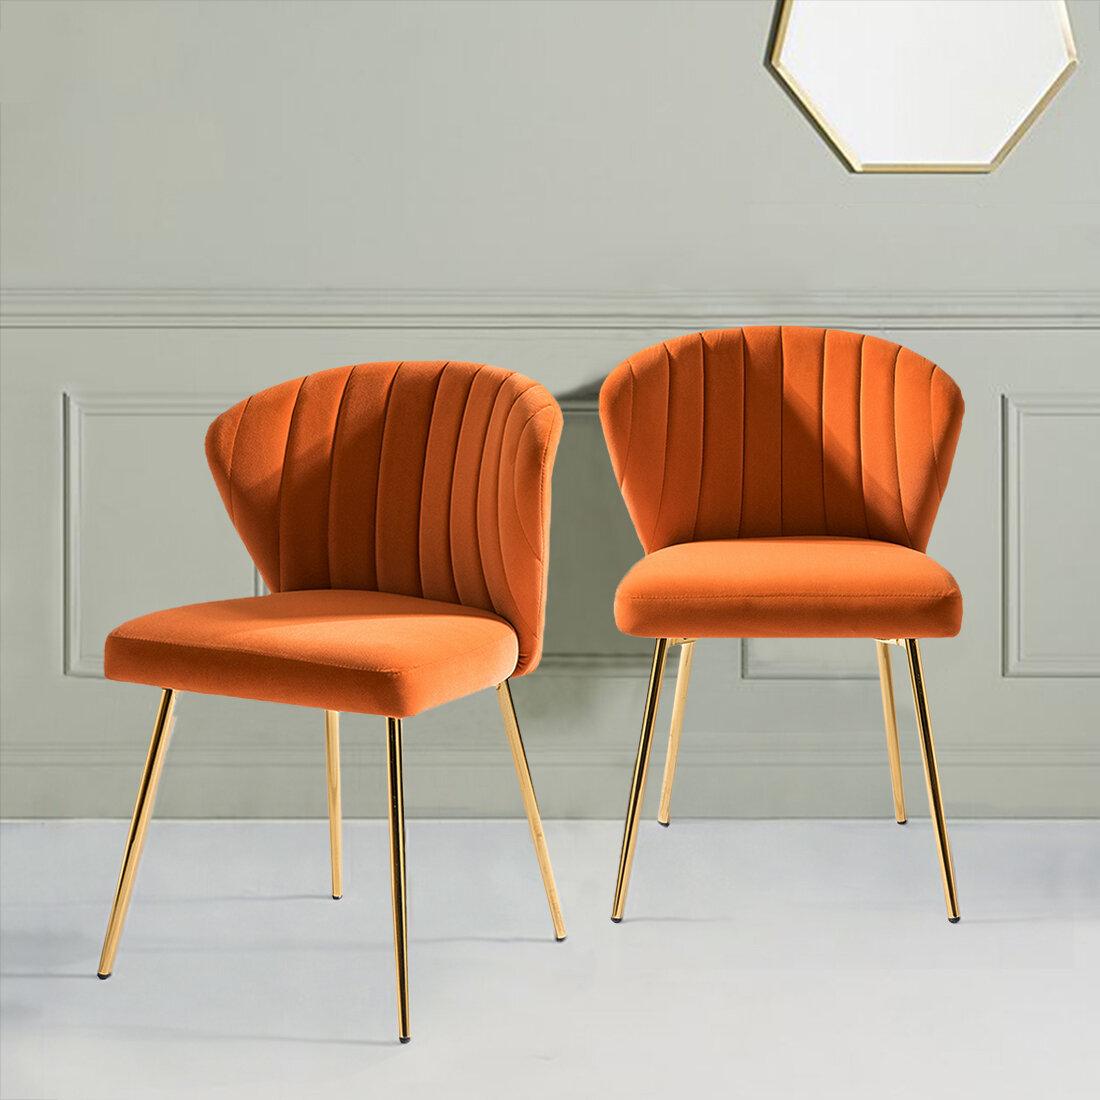 Orange Velvet Accent Chairs You'Ll Love In 2021 | Wayfair Regarding Esmund Side Chairs (Set Of 2) (View 5 of 15)